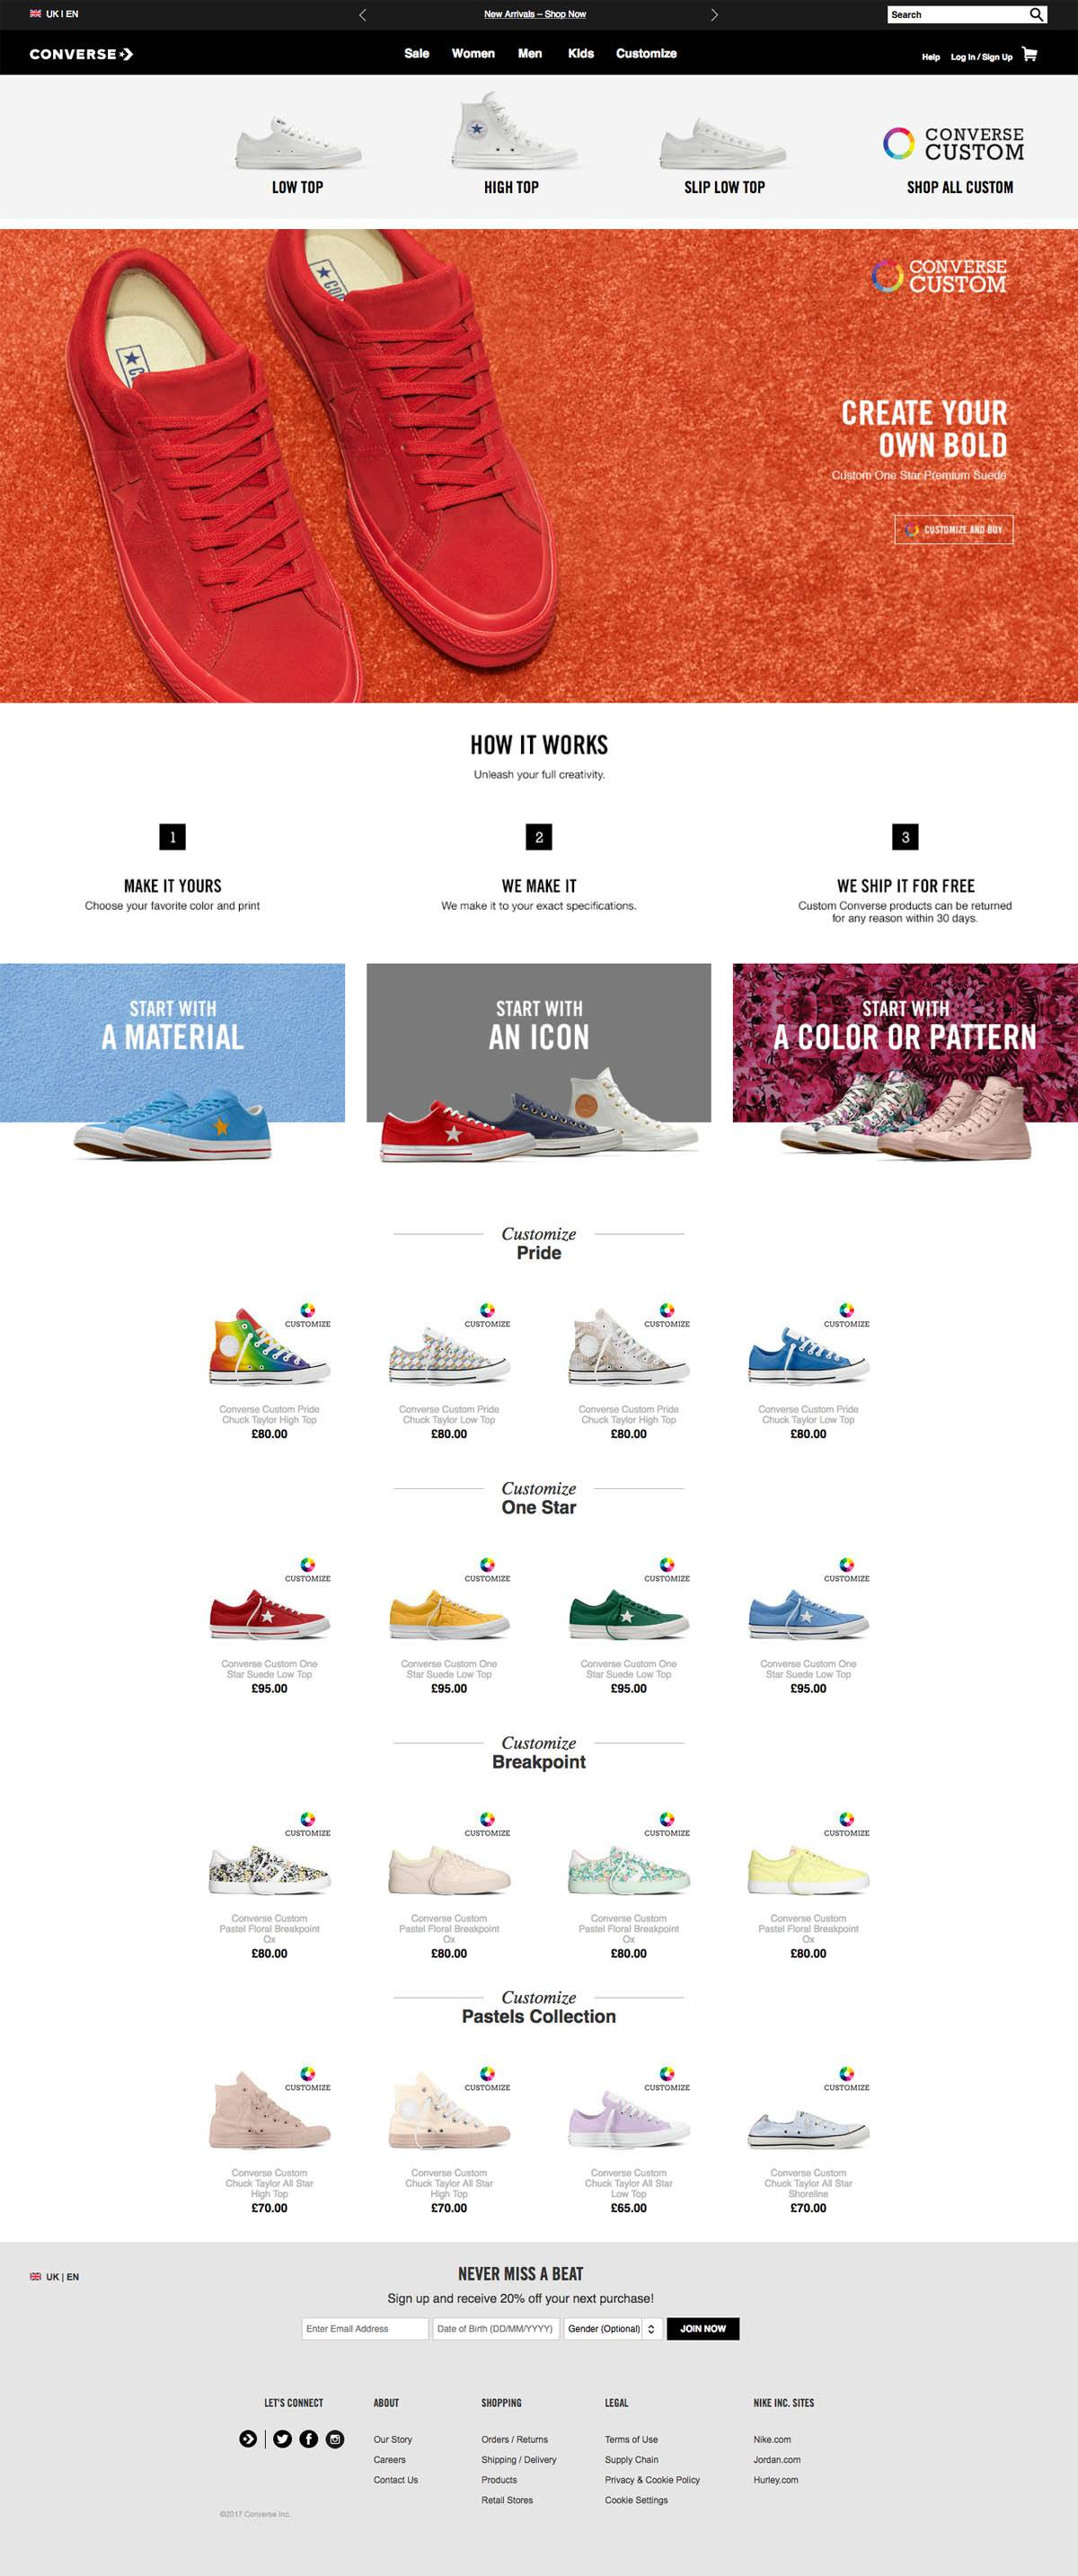 eCommerce website: Converse